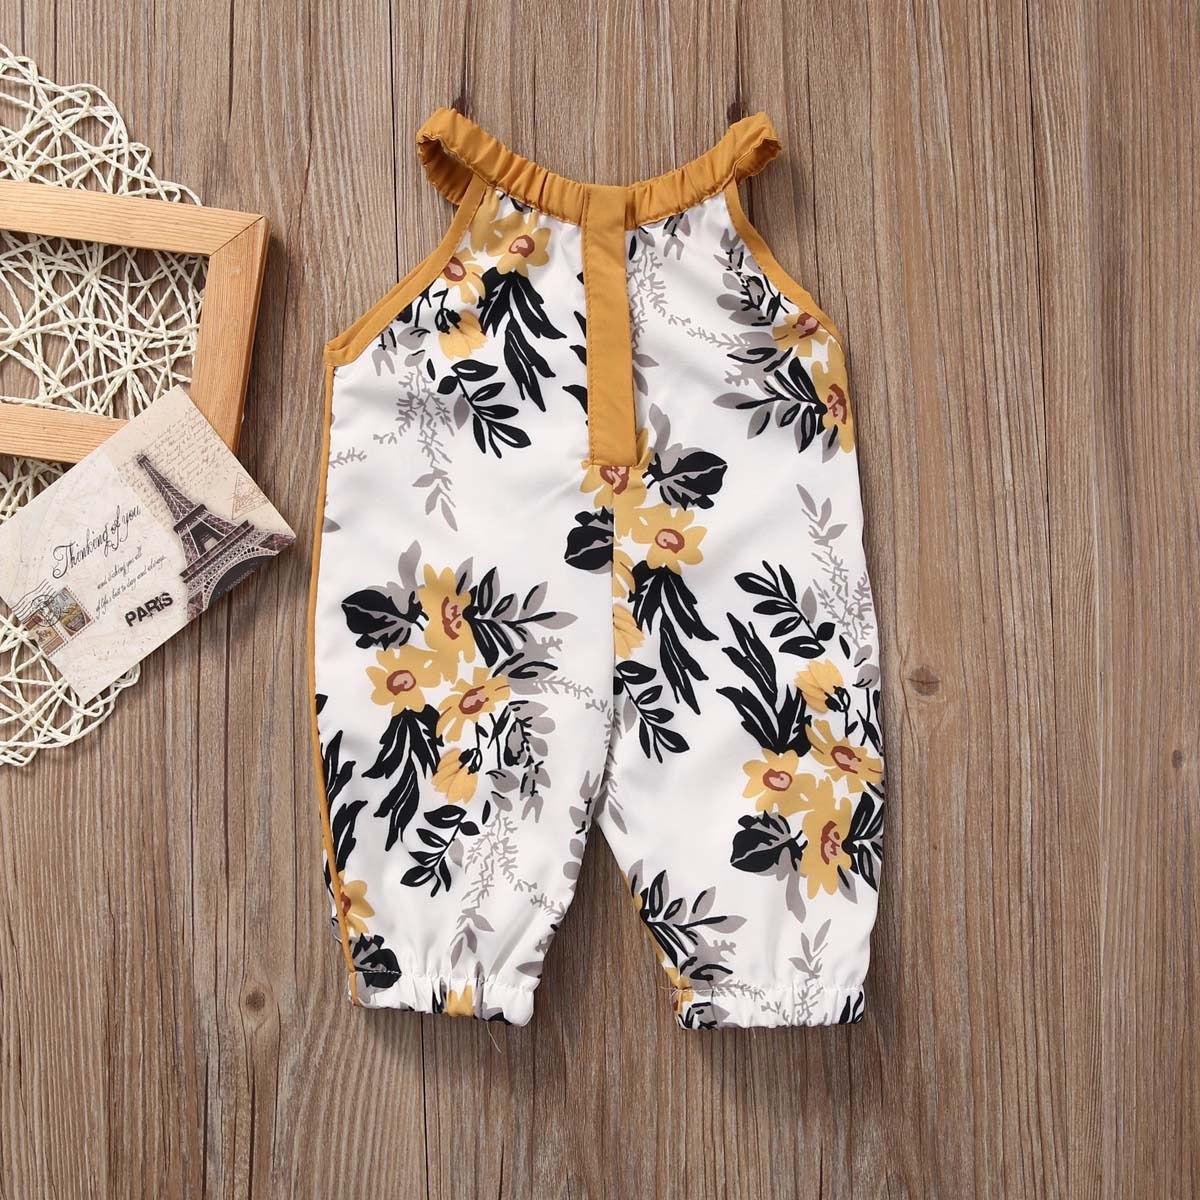 New Style 2018 Newborn Baby Kids Girls Sleeveless O Neck Print Romper Jumpsuit Outfits